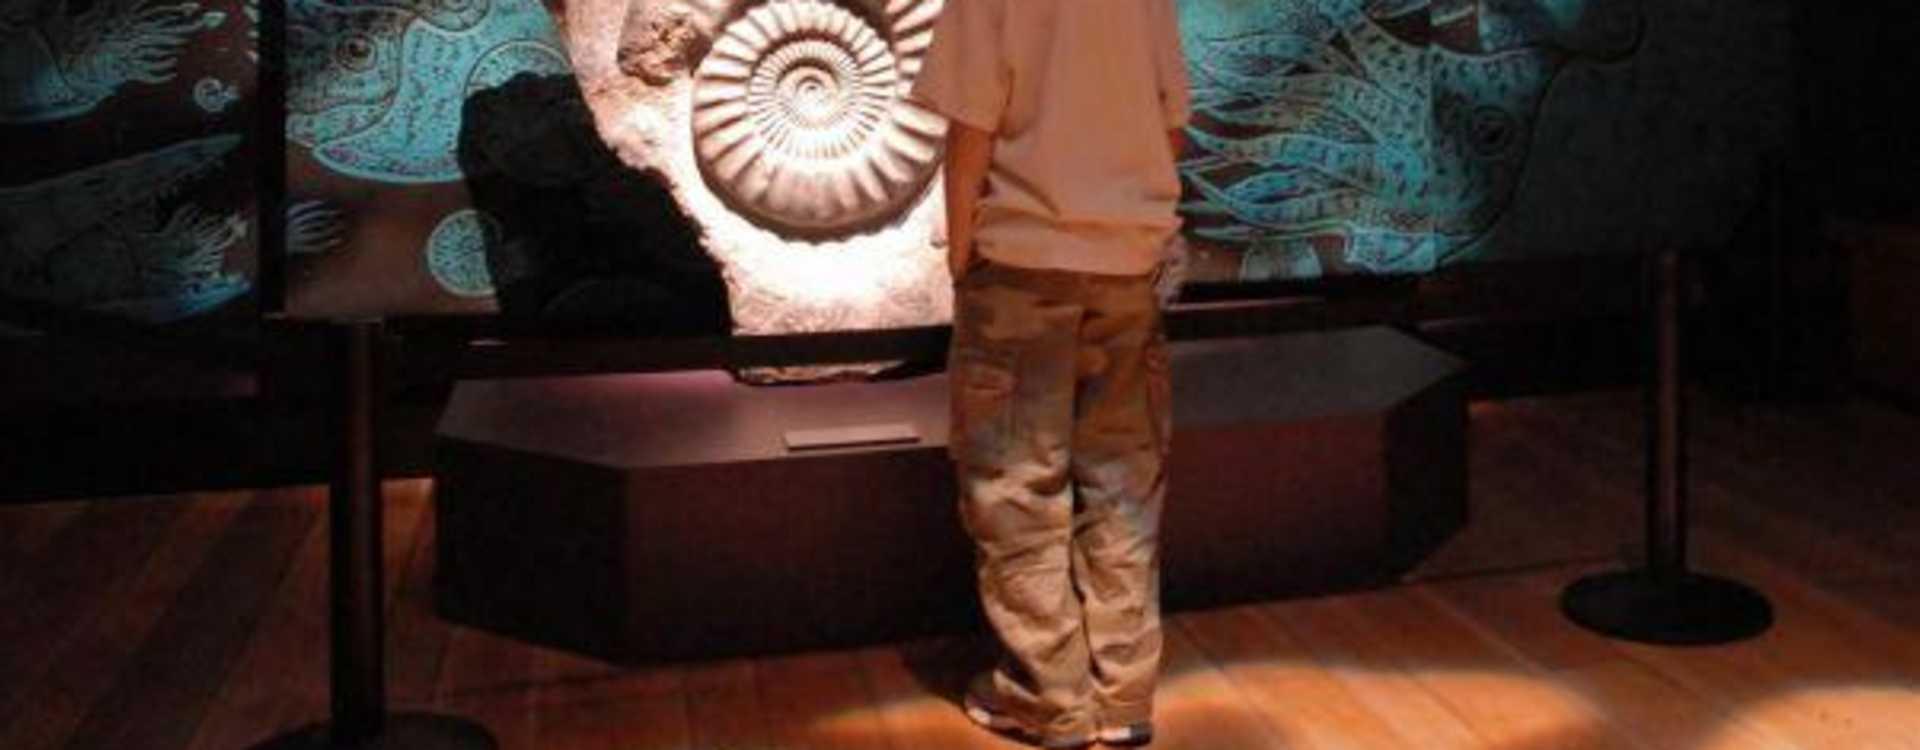 Burke_Museum.jpg